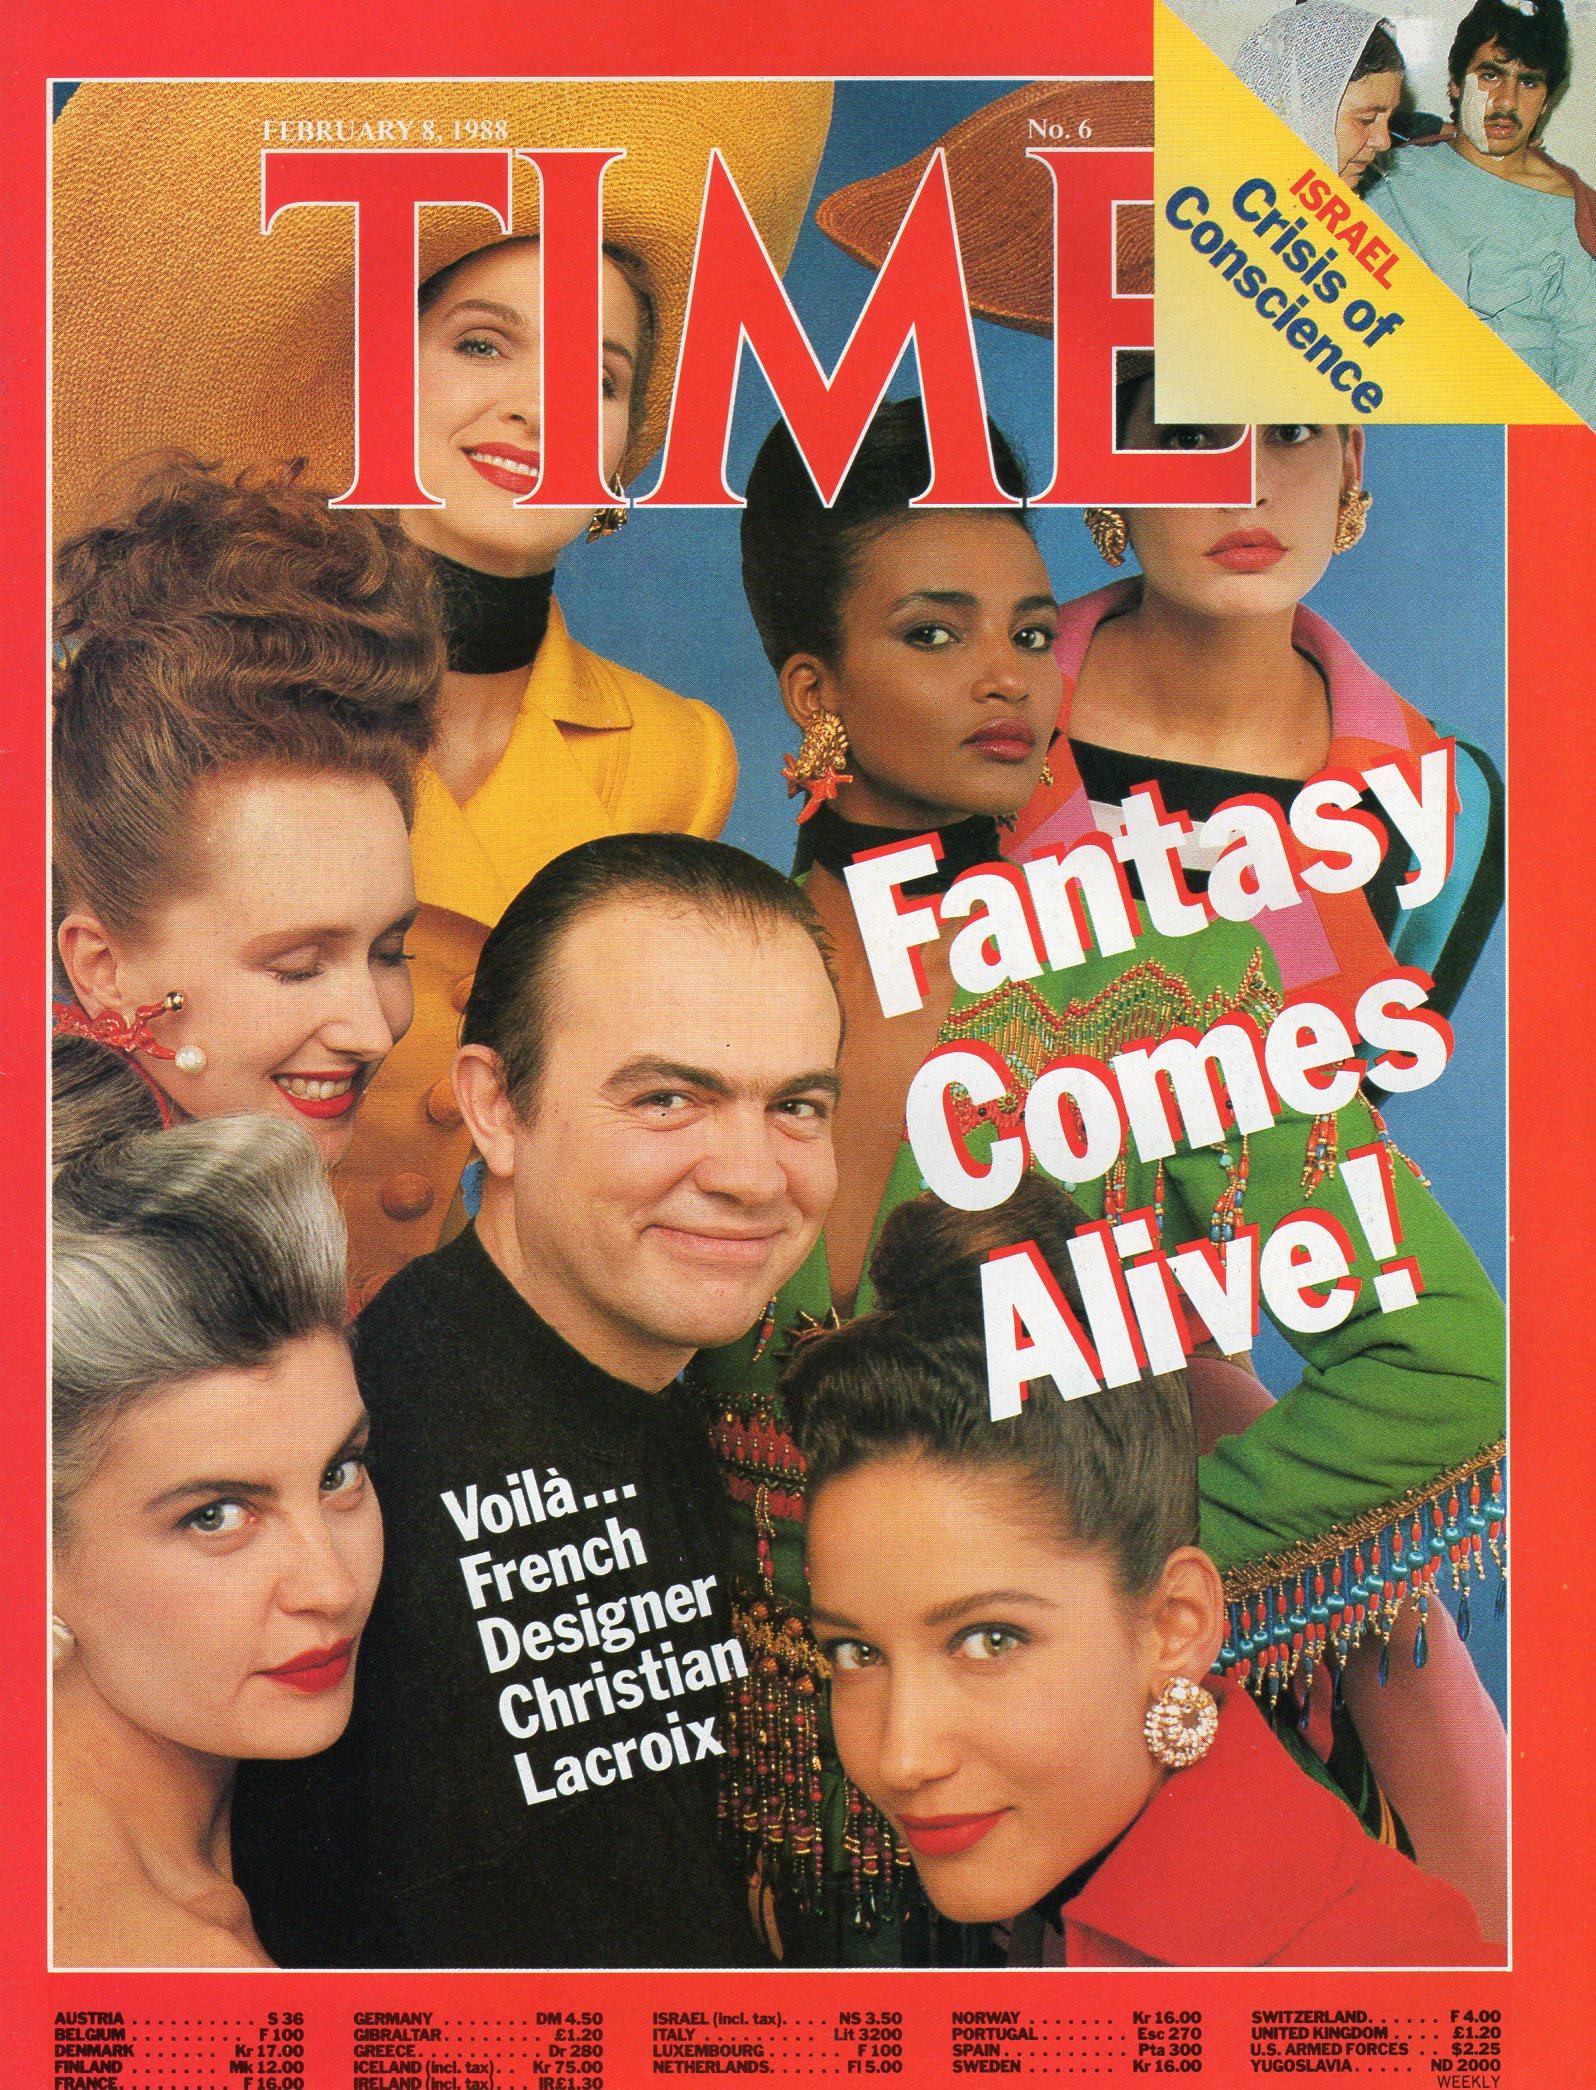 Time magazine, Christian Lacroix, modelling, Haute Couture